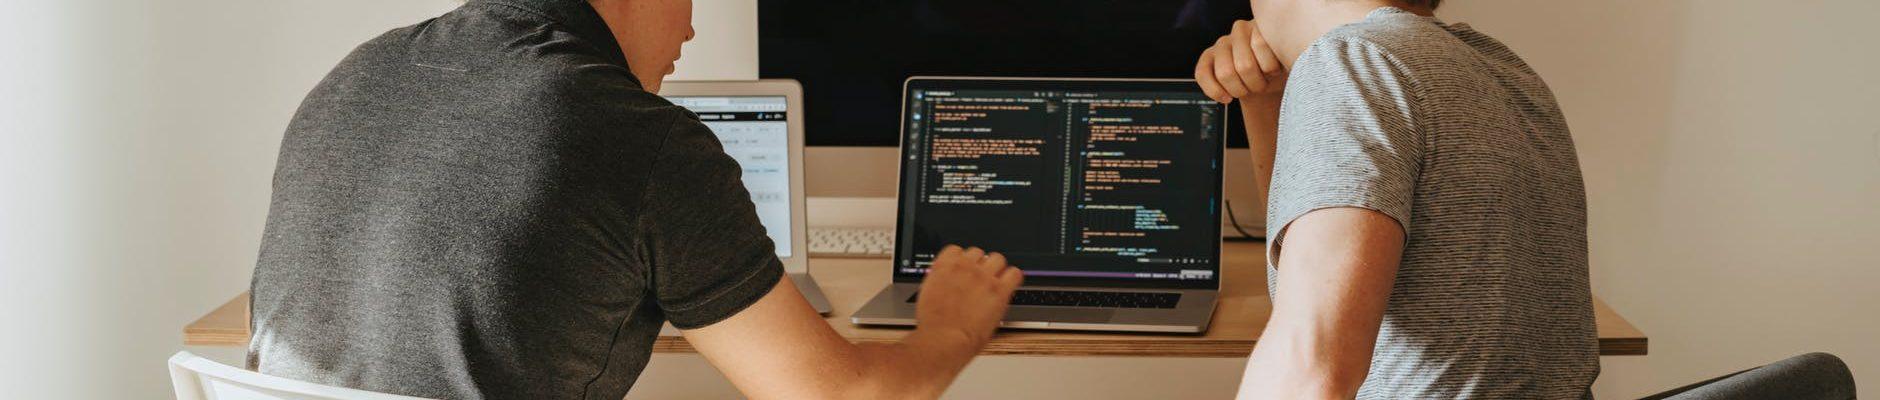 How To Find Best Custom Web Development Service